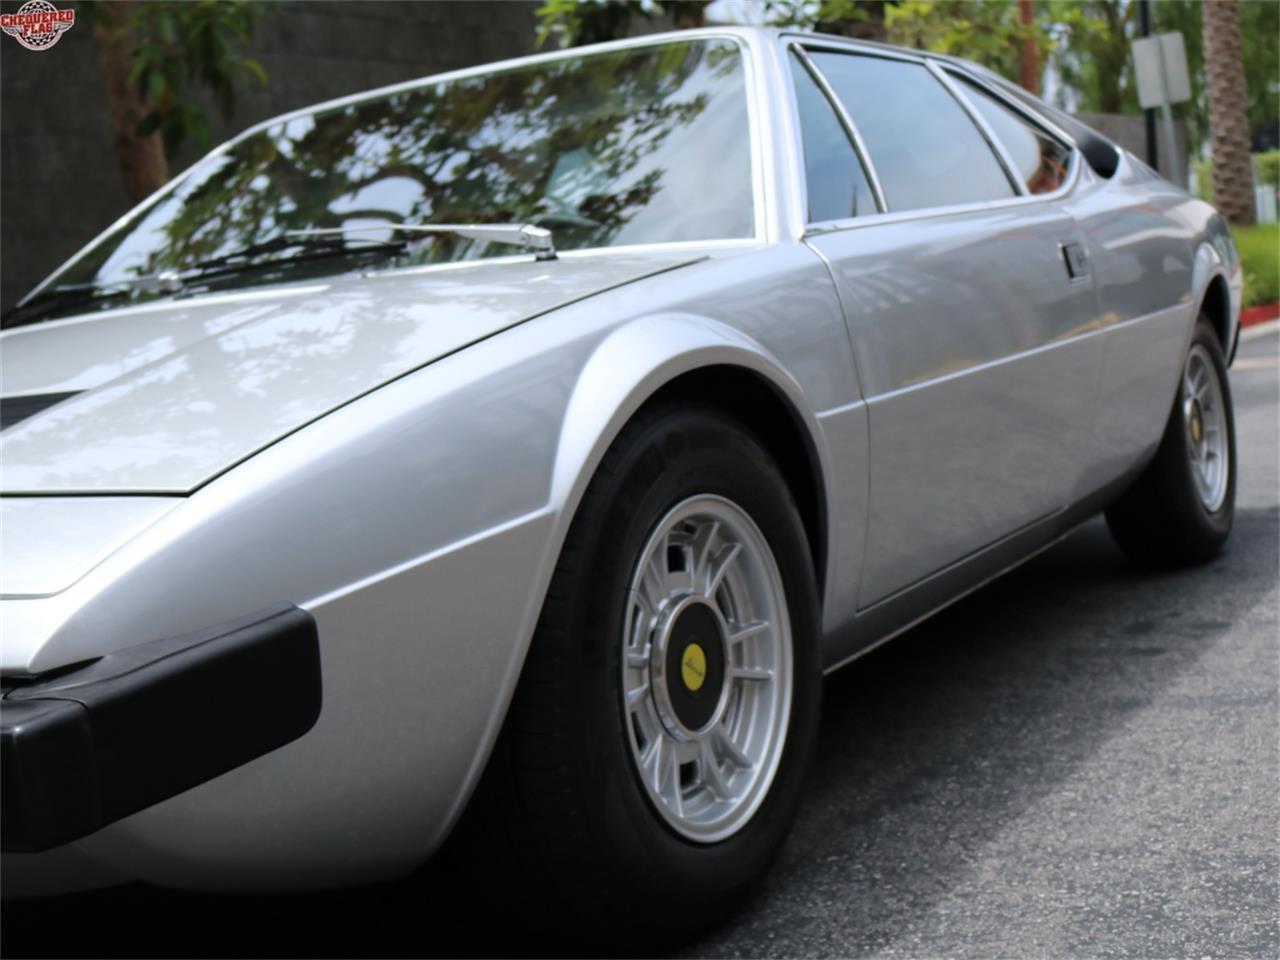 Large Picture of '75 Ferrari 308 located in Marina Del Rey California - $79,500.00 - L812